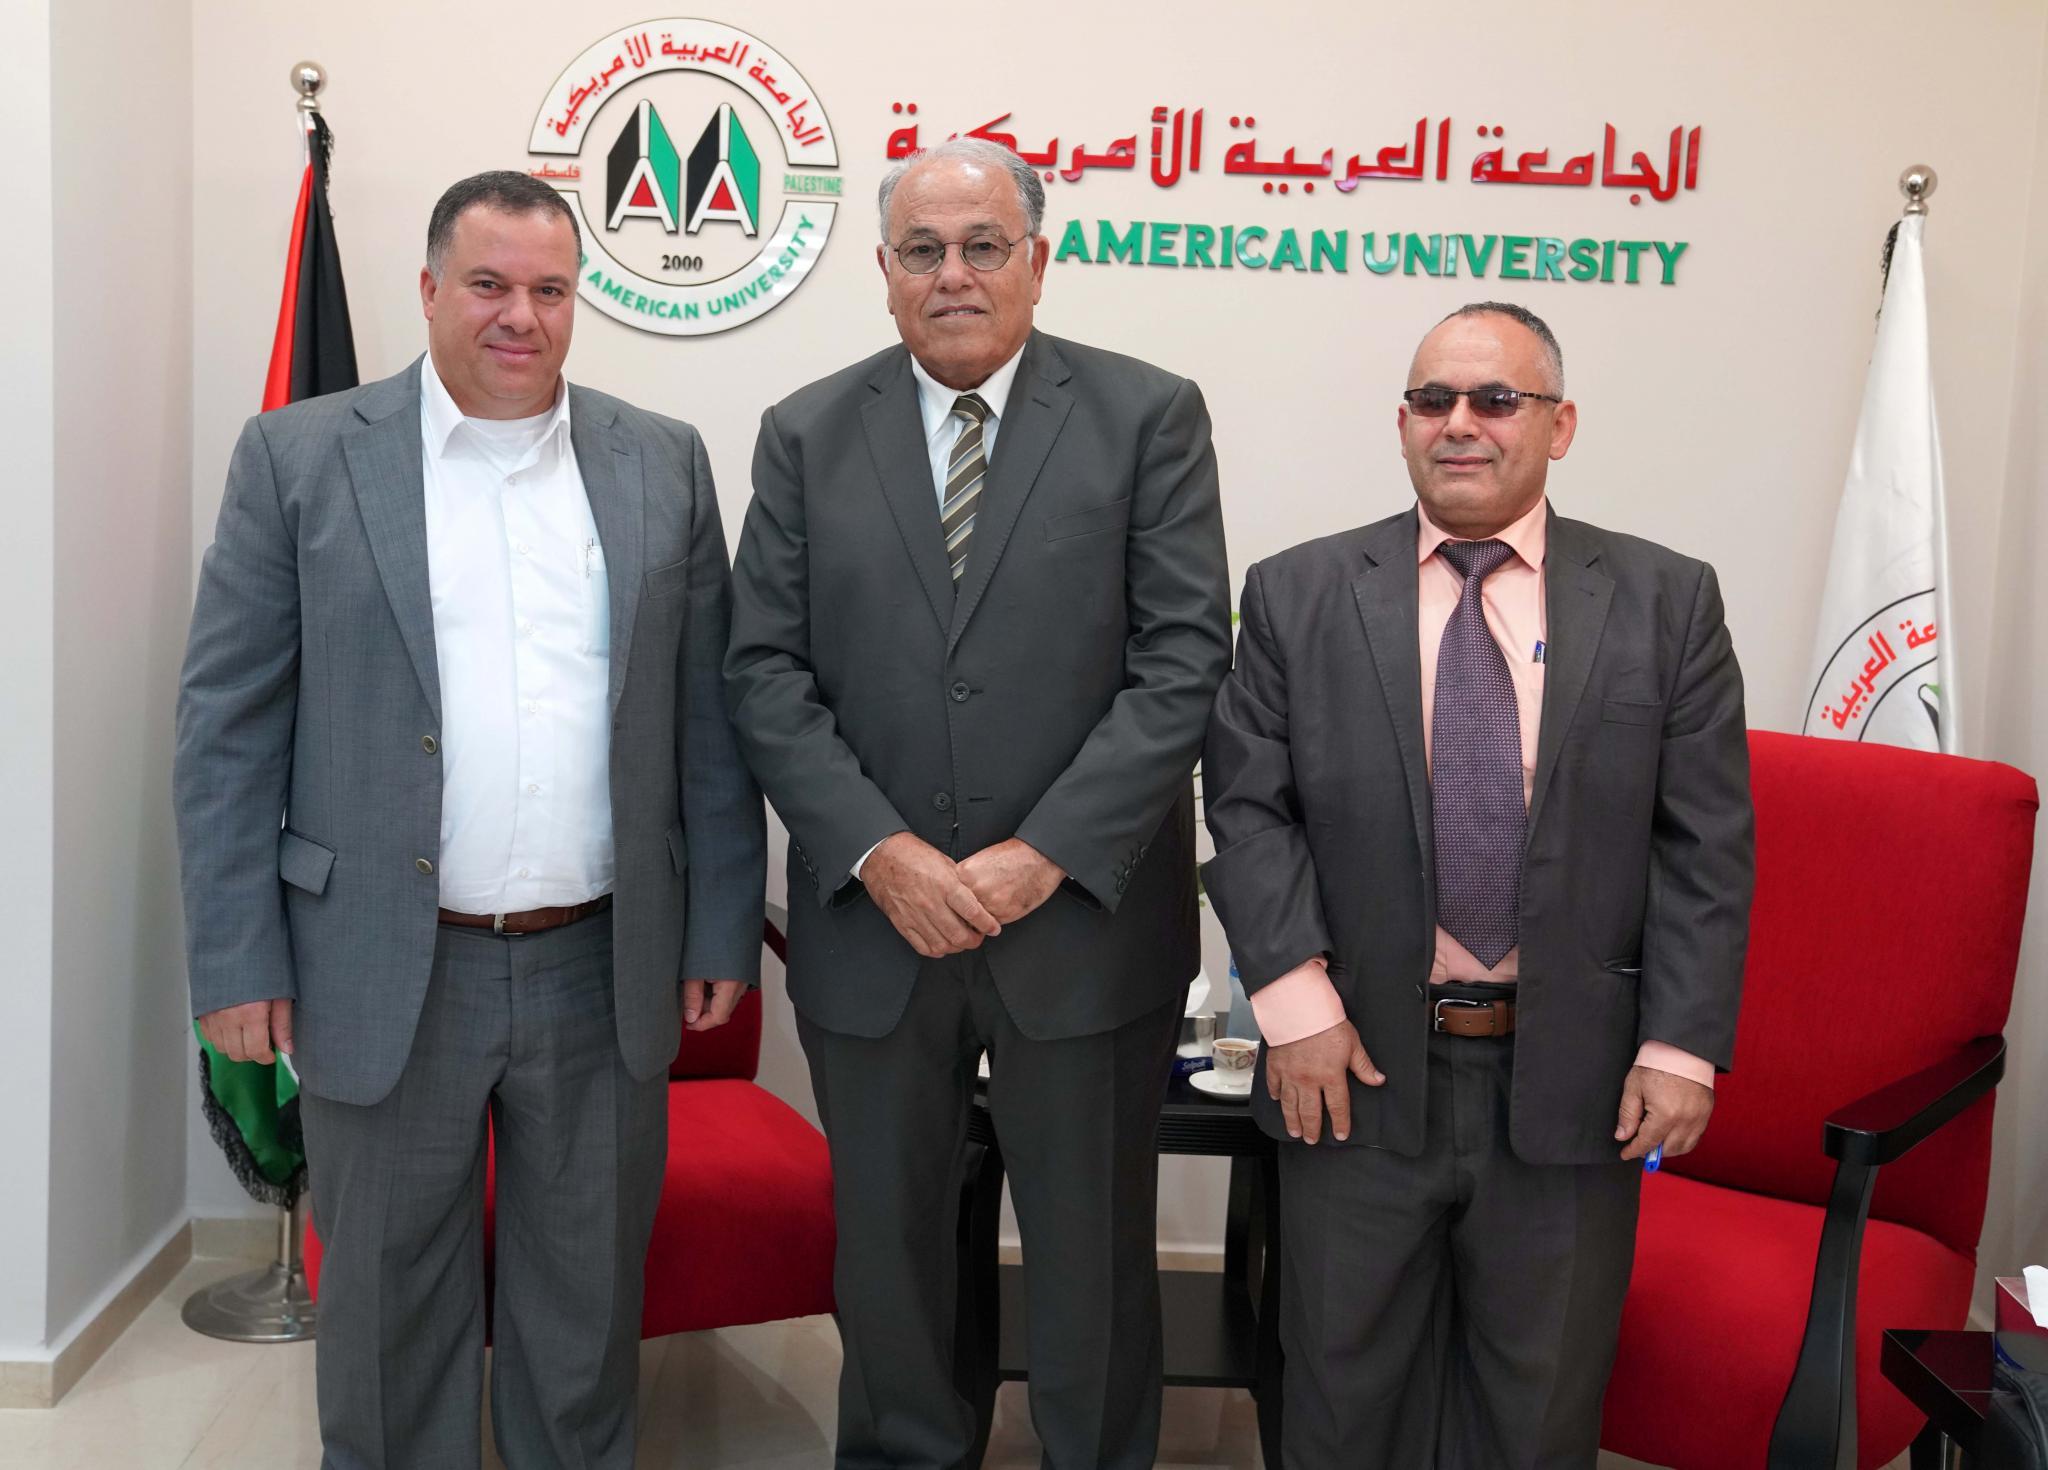 The university hosts the businessman Mr. Shaddad Khanfar